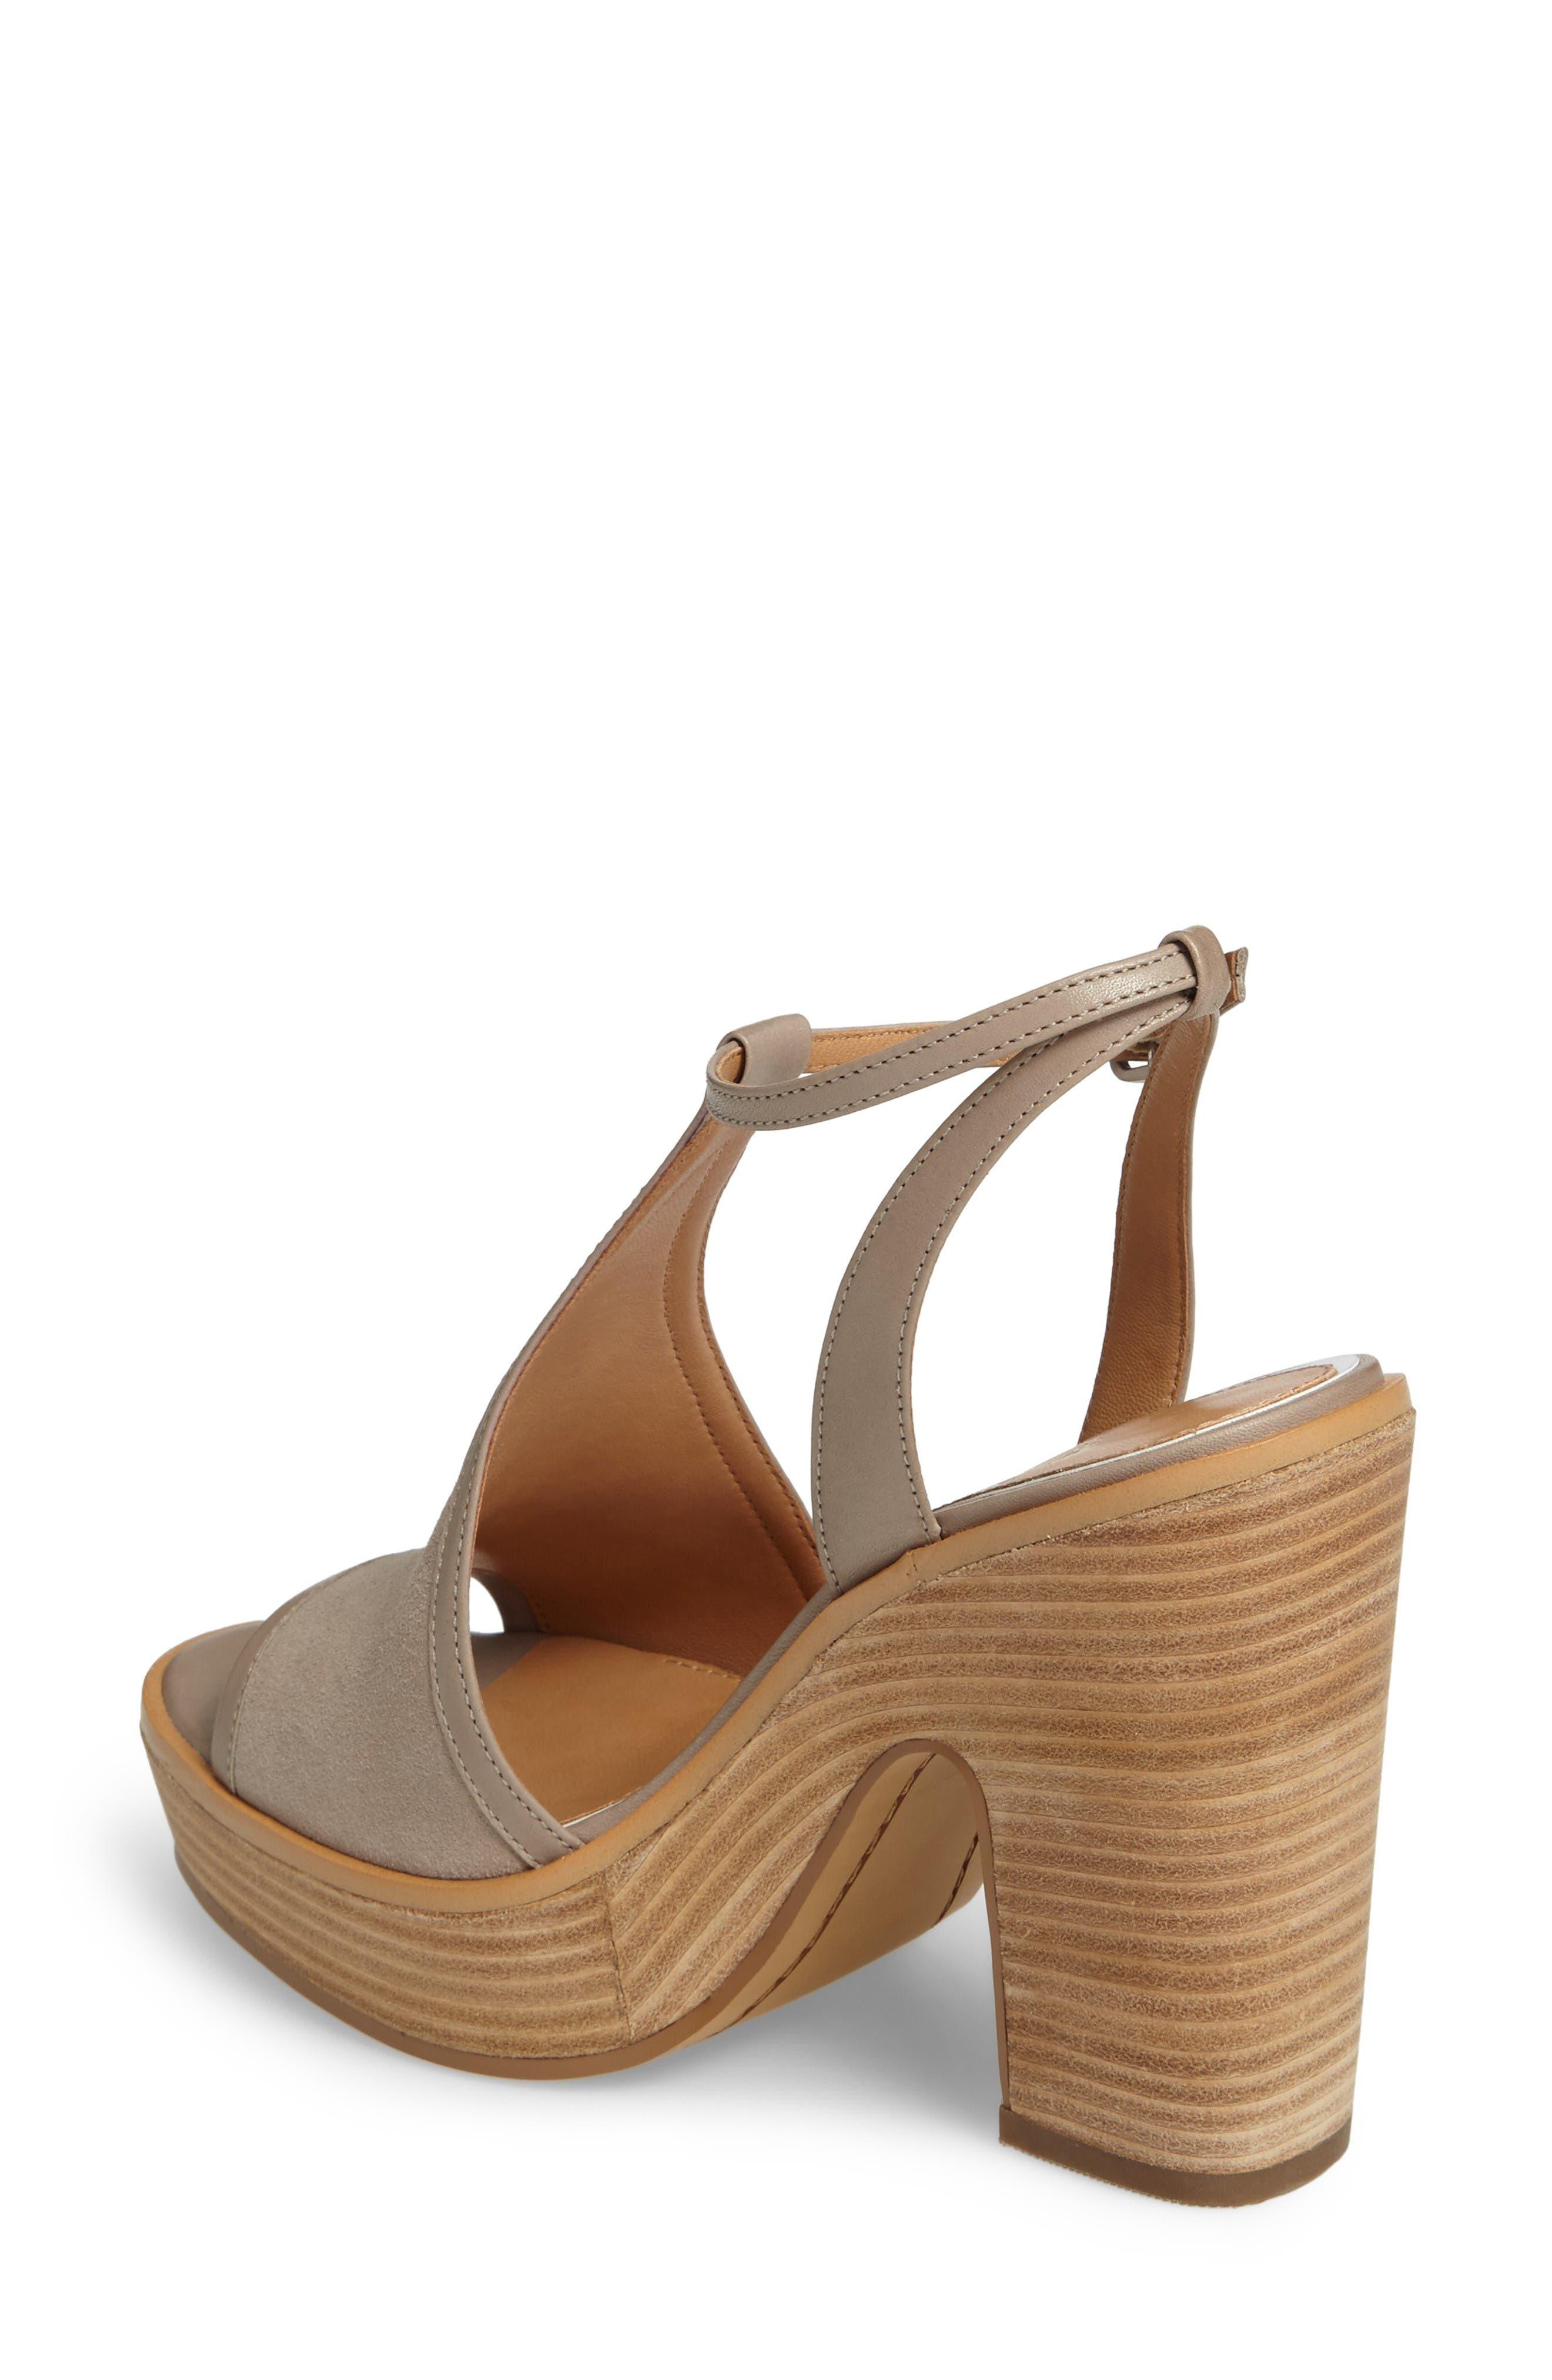 India T-Strap Platform Sandal,                             Alternate thumbnail 2, color,                             Rock Suede